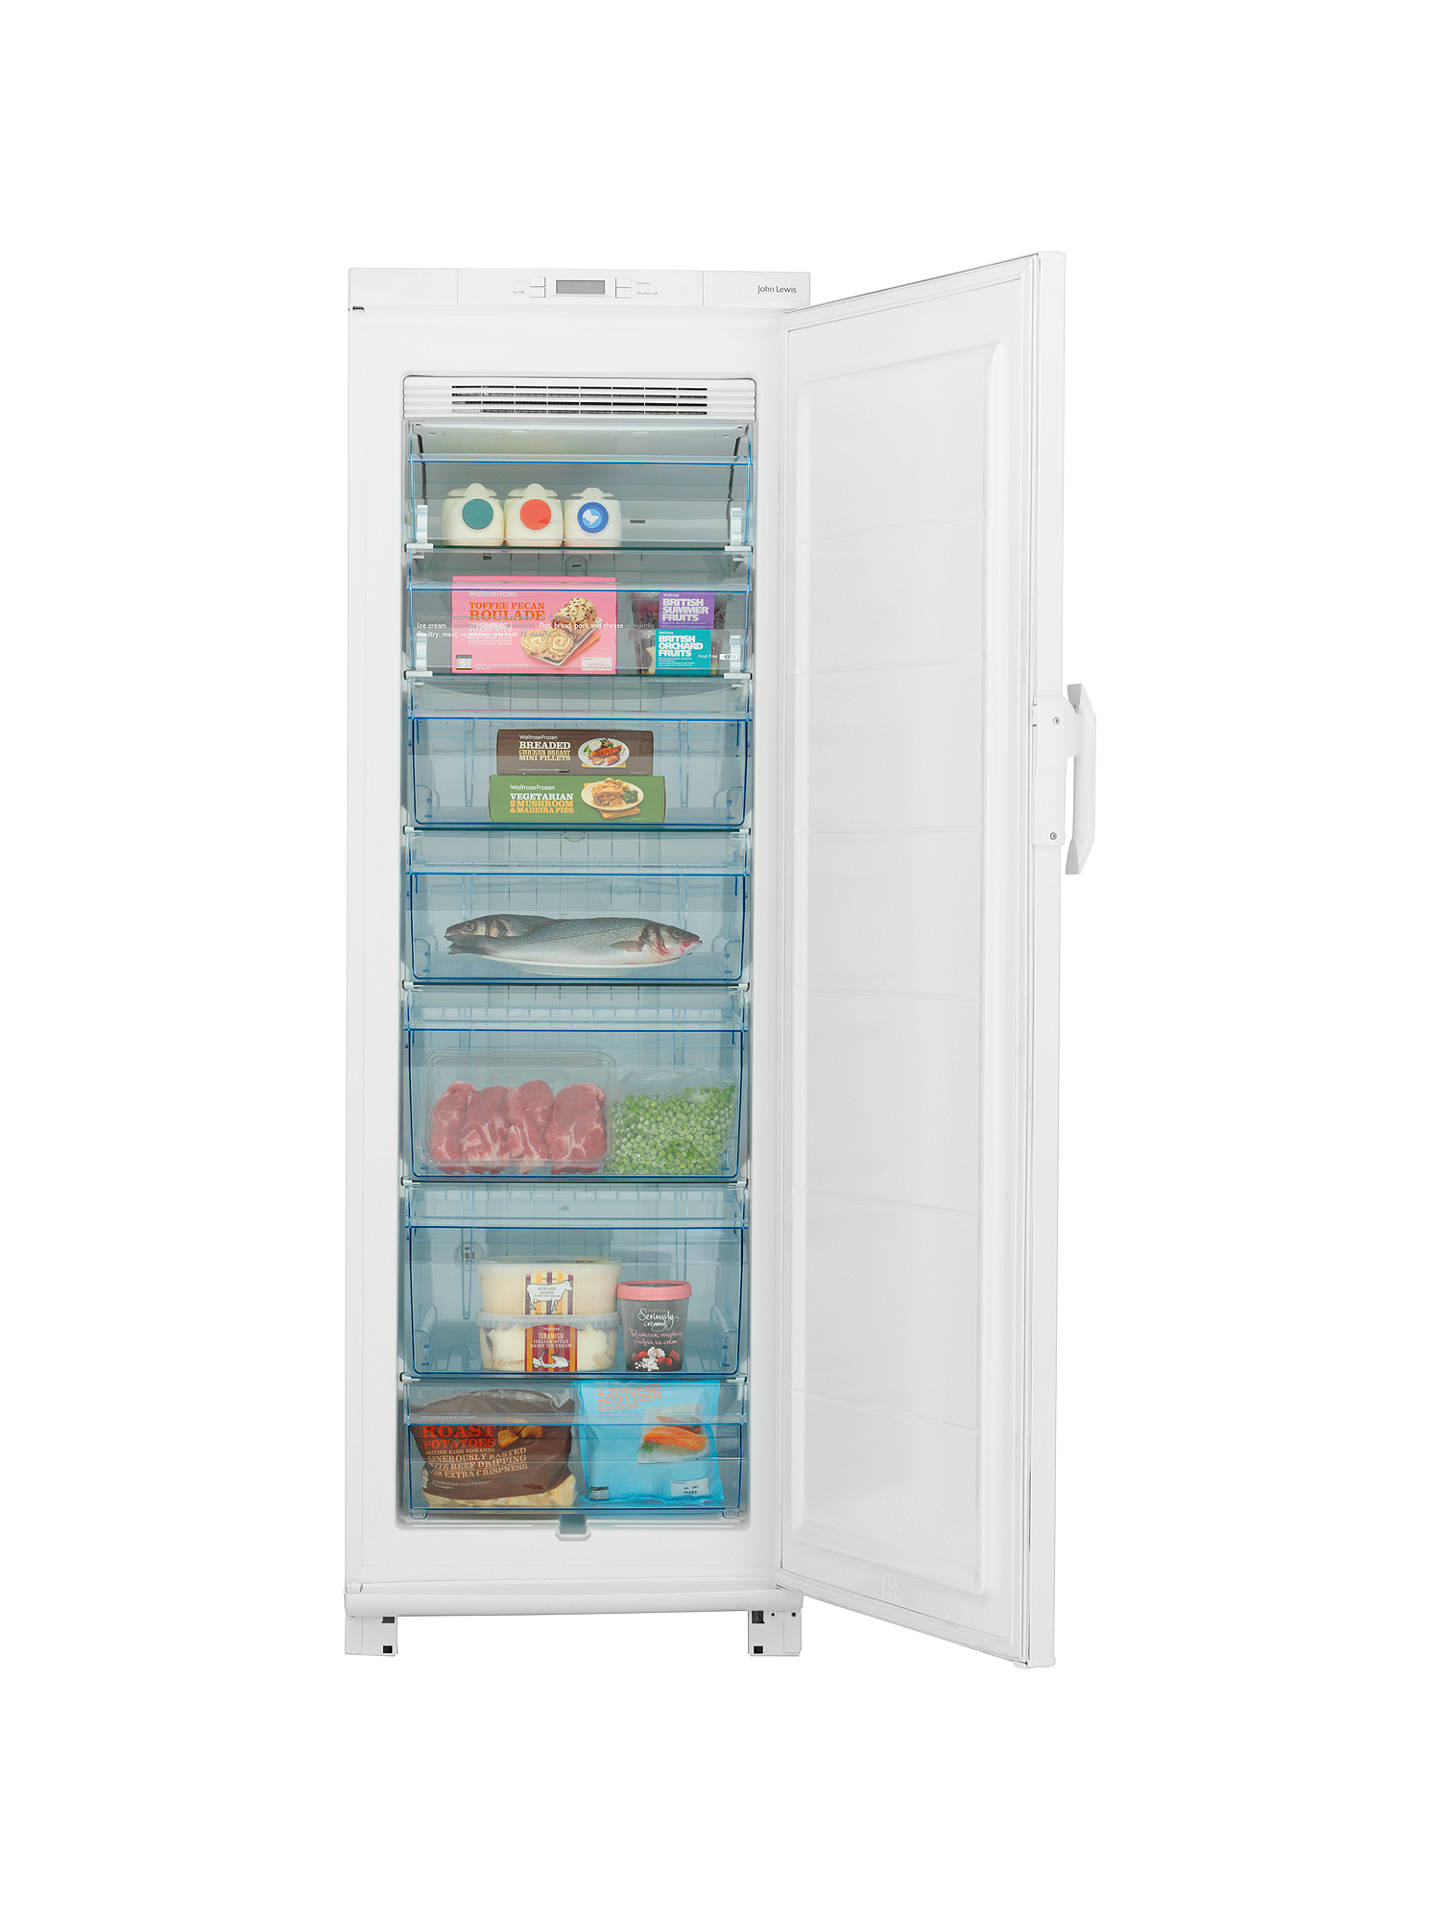 john lewis jlucfzw6010 frost free freezer manual